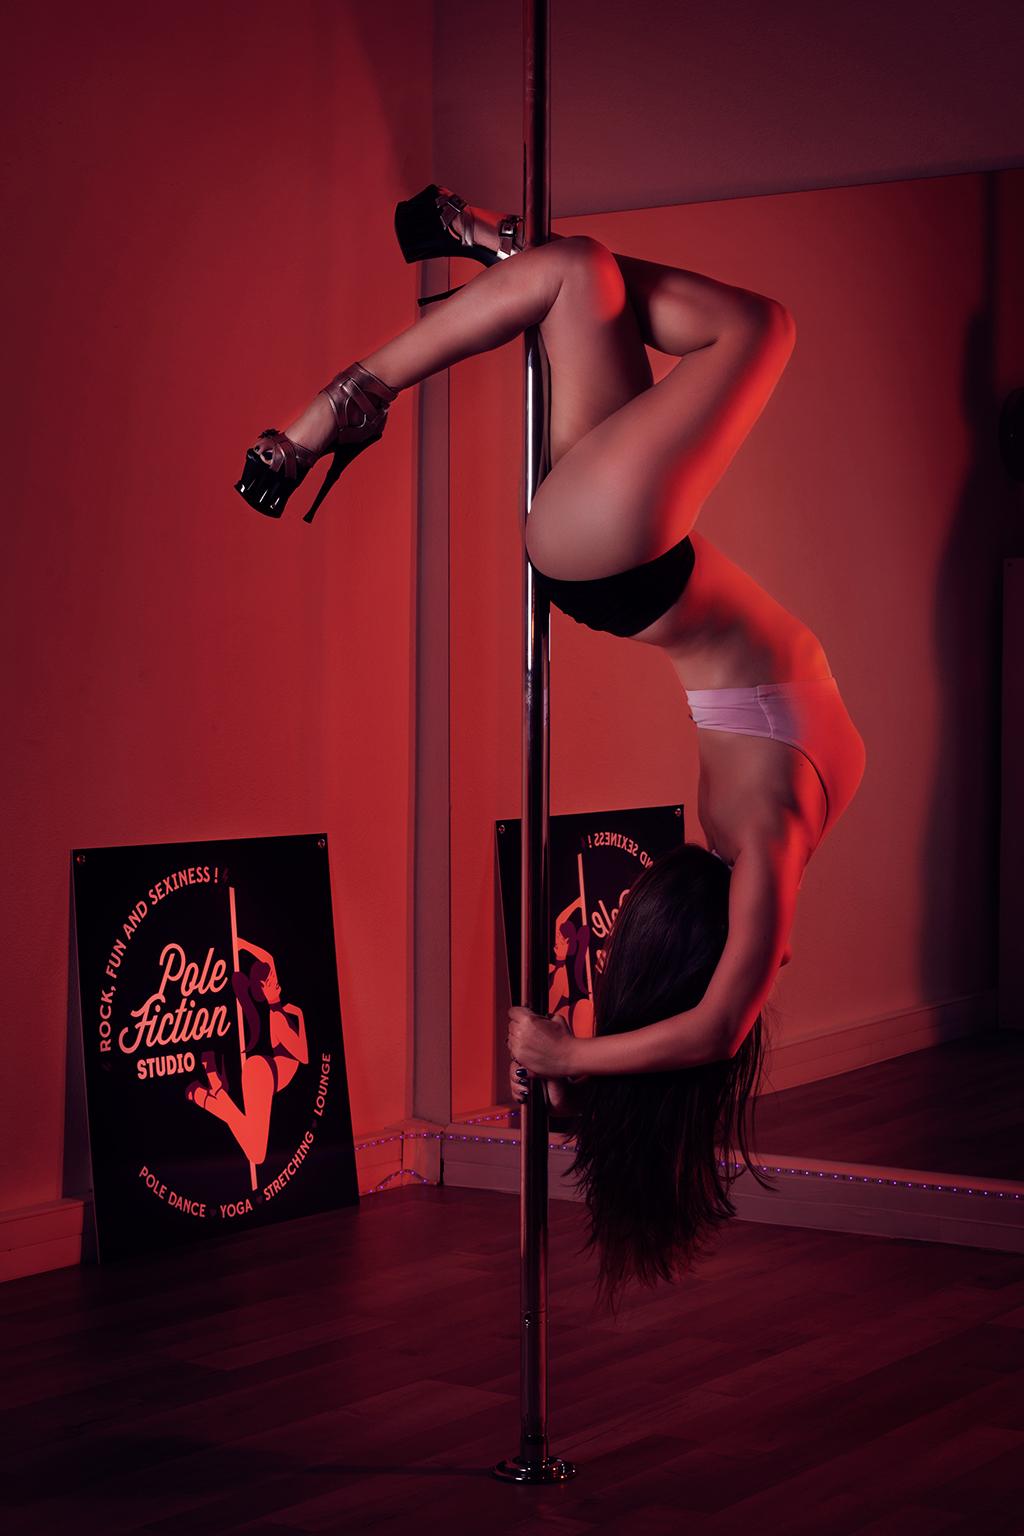 Pole-Shoot-Secretary-Pole-Fiction-Studio-min